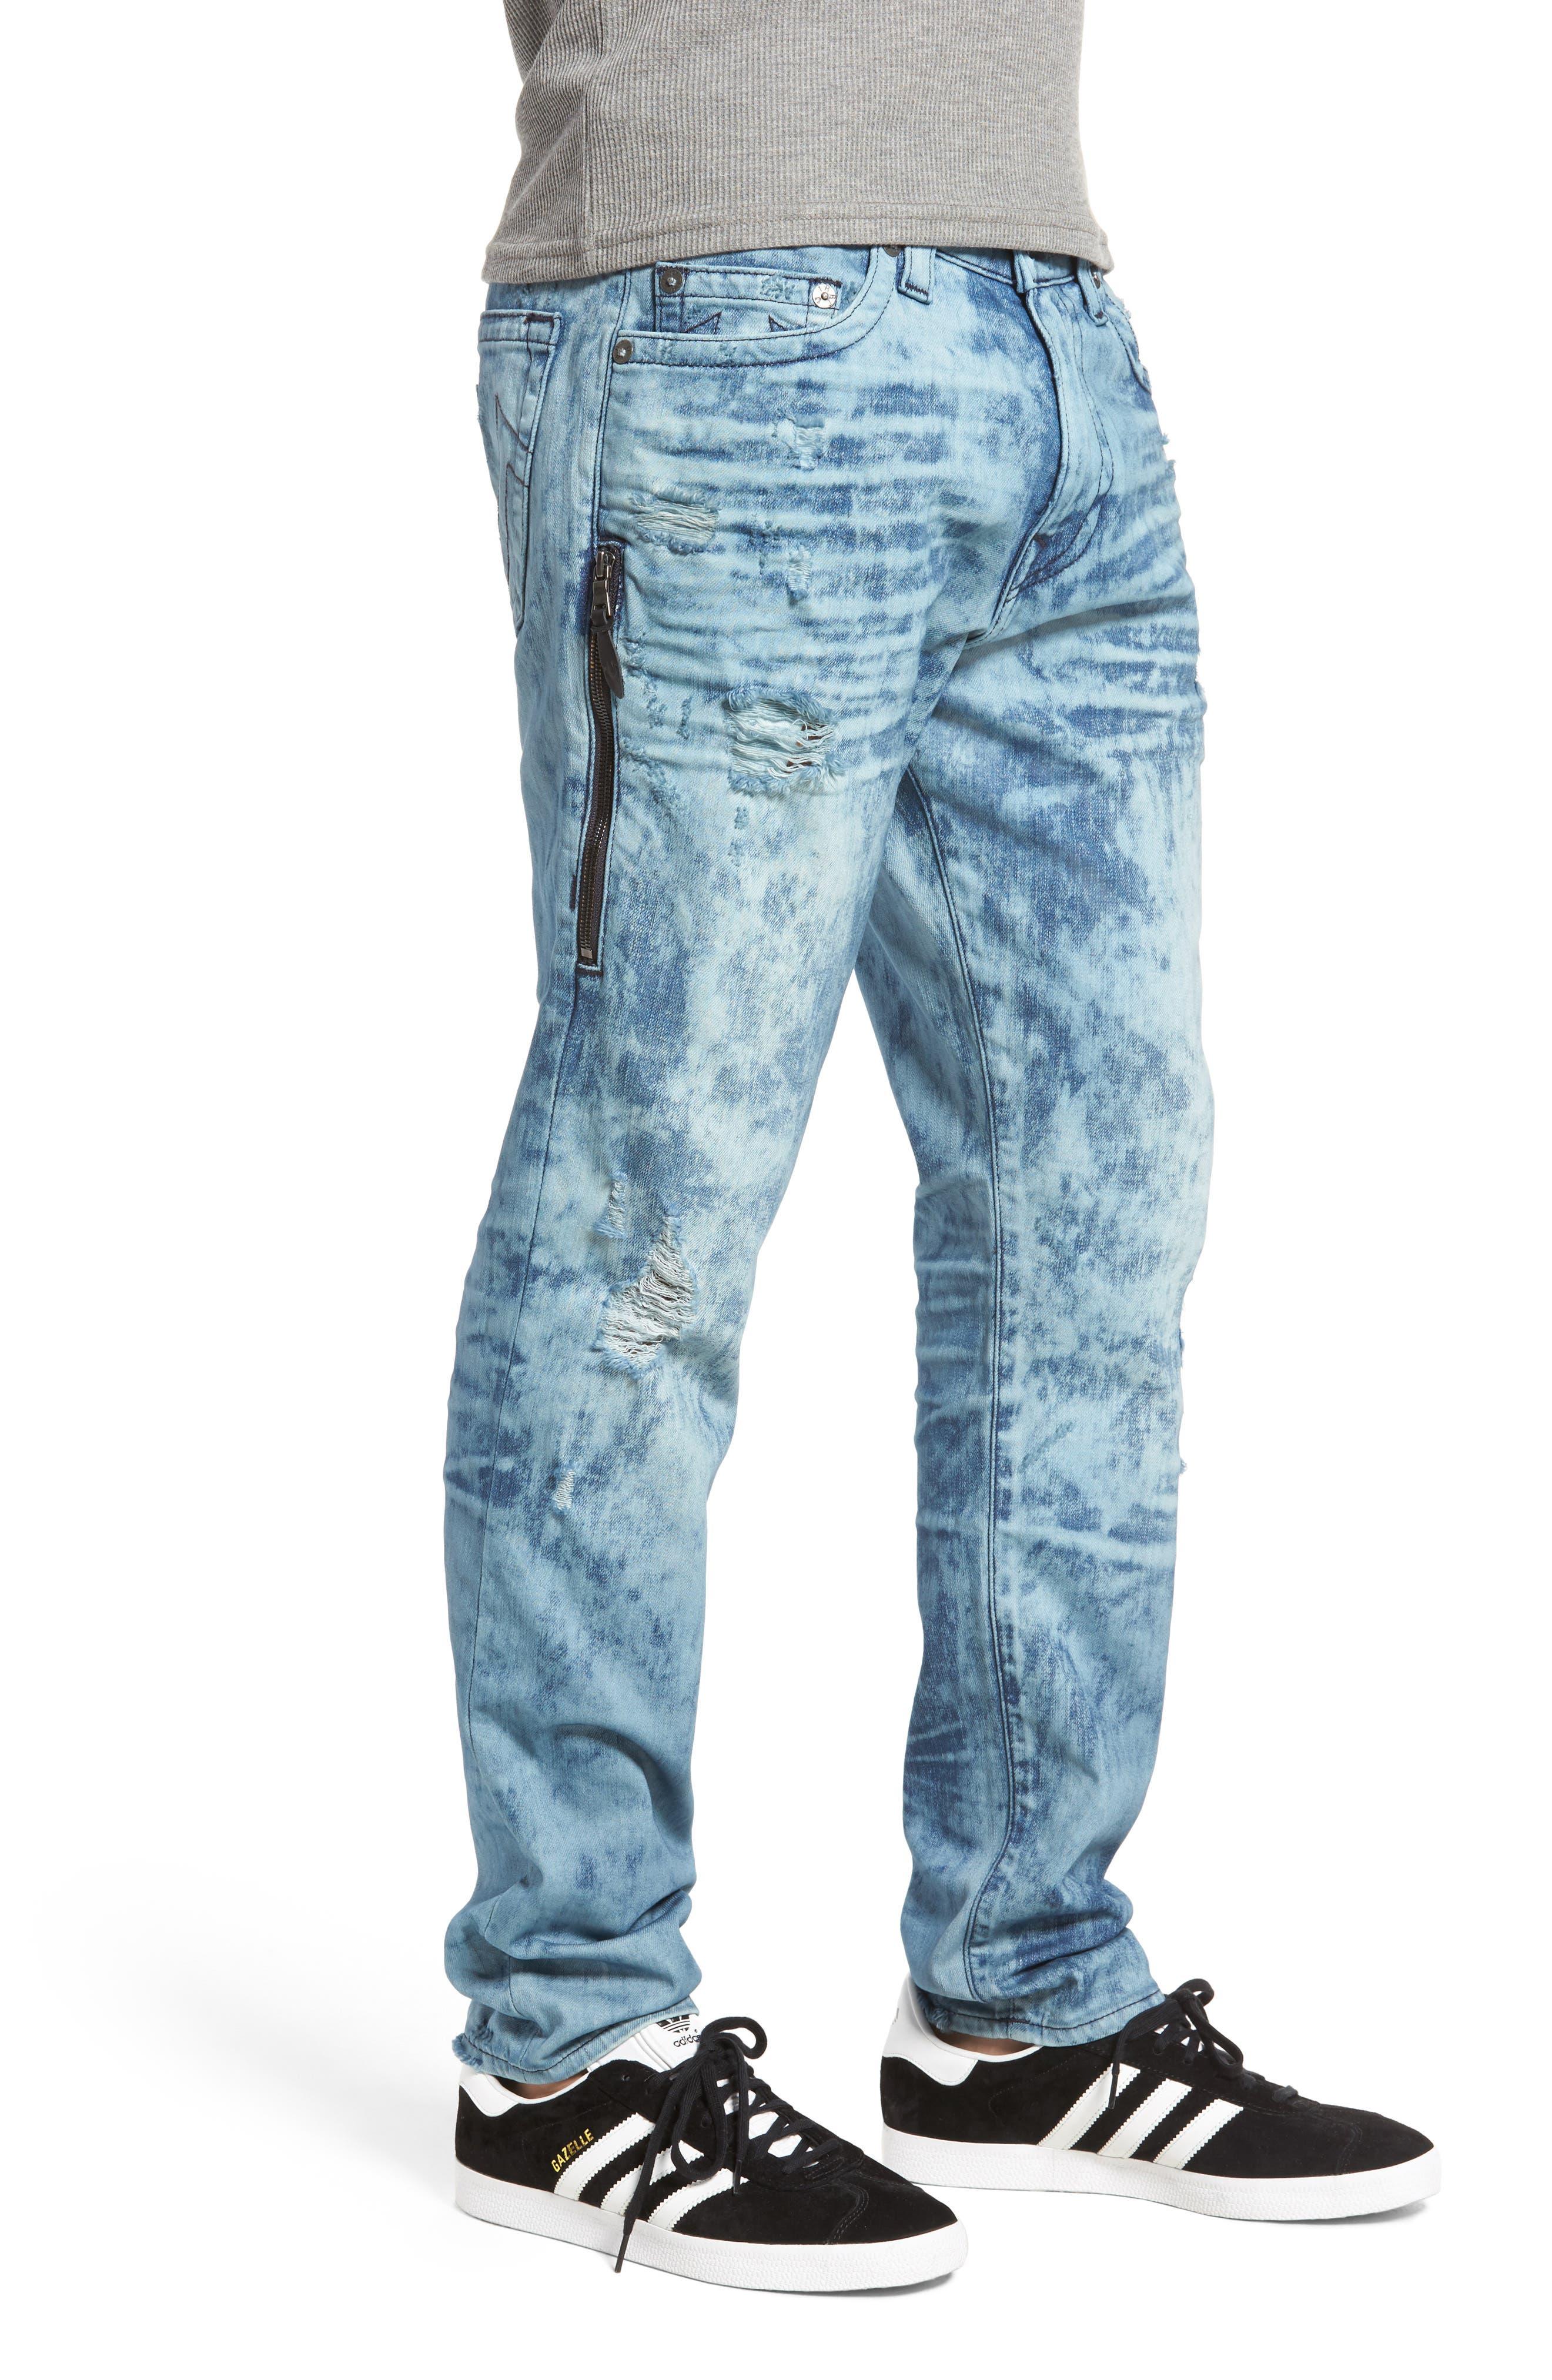 Mick Skinny Fit Jeans,                             Alternate thumbnail 3, color,                             401